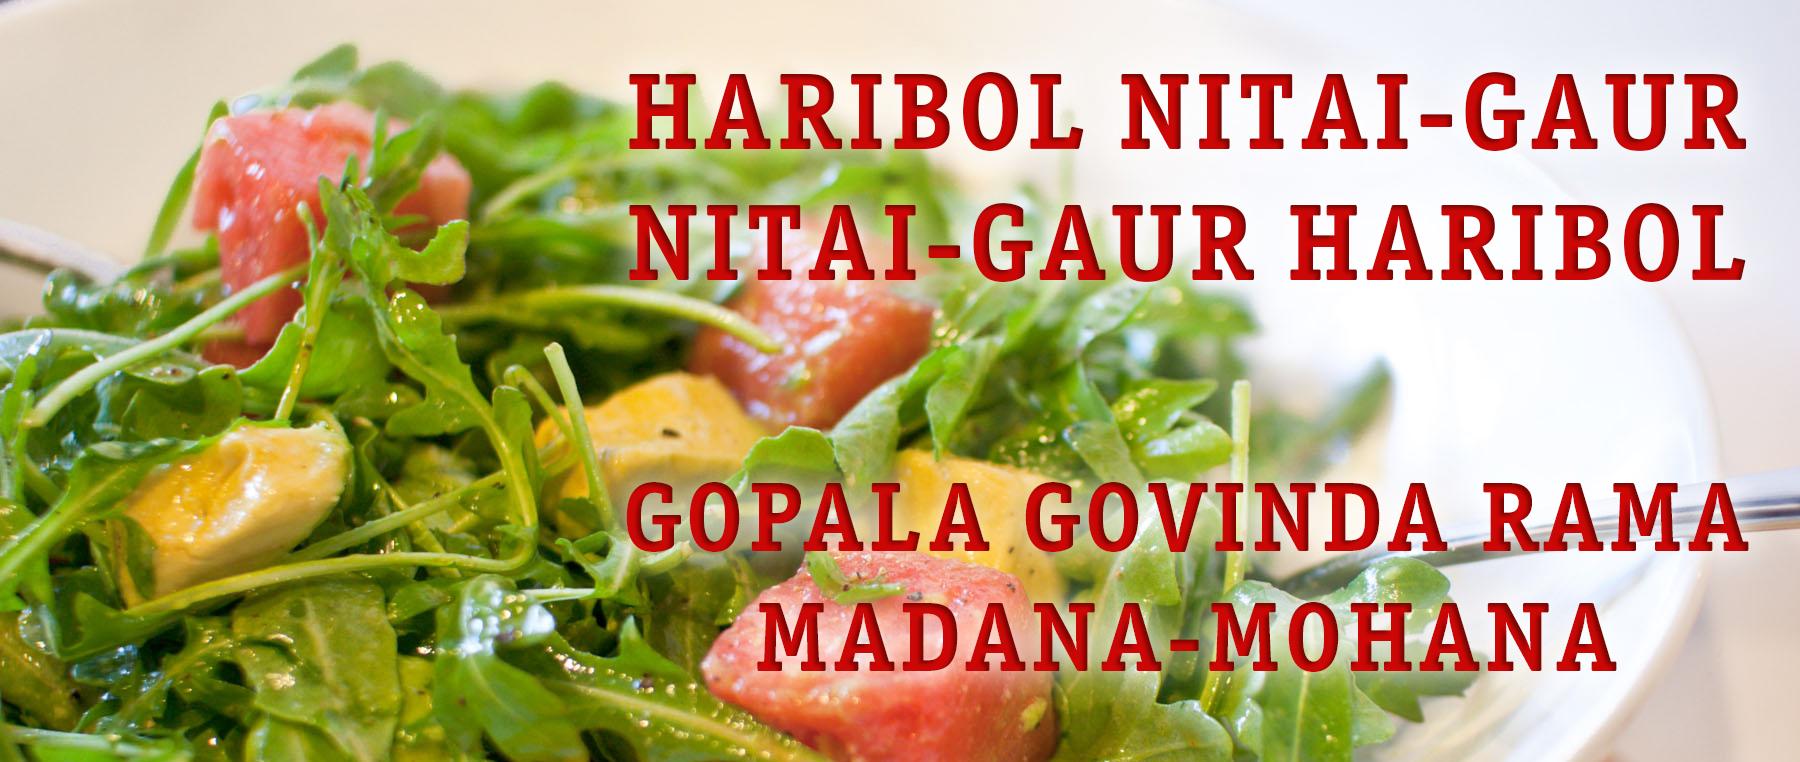 GOPALA GOVINDA RAMA MADANA-MOHANA_haribol